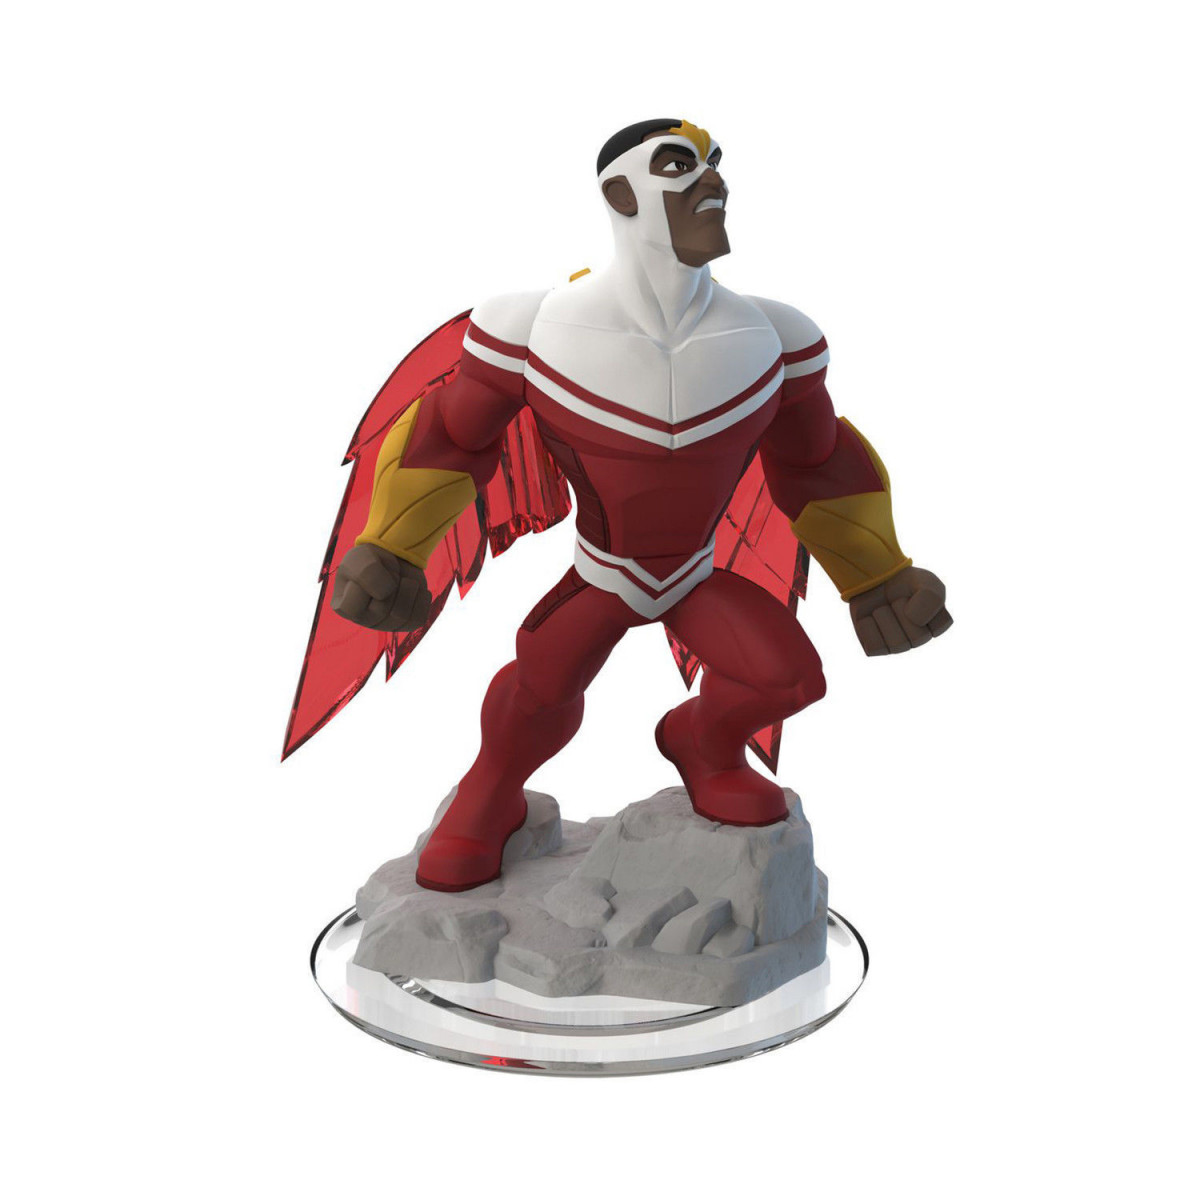 Disney Infinity 2.0 - Falcon játékfigura